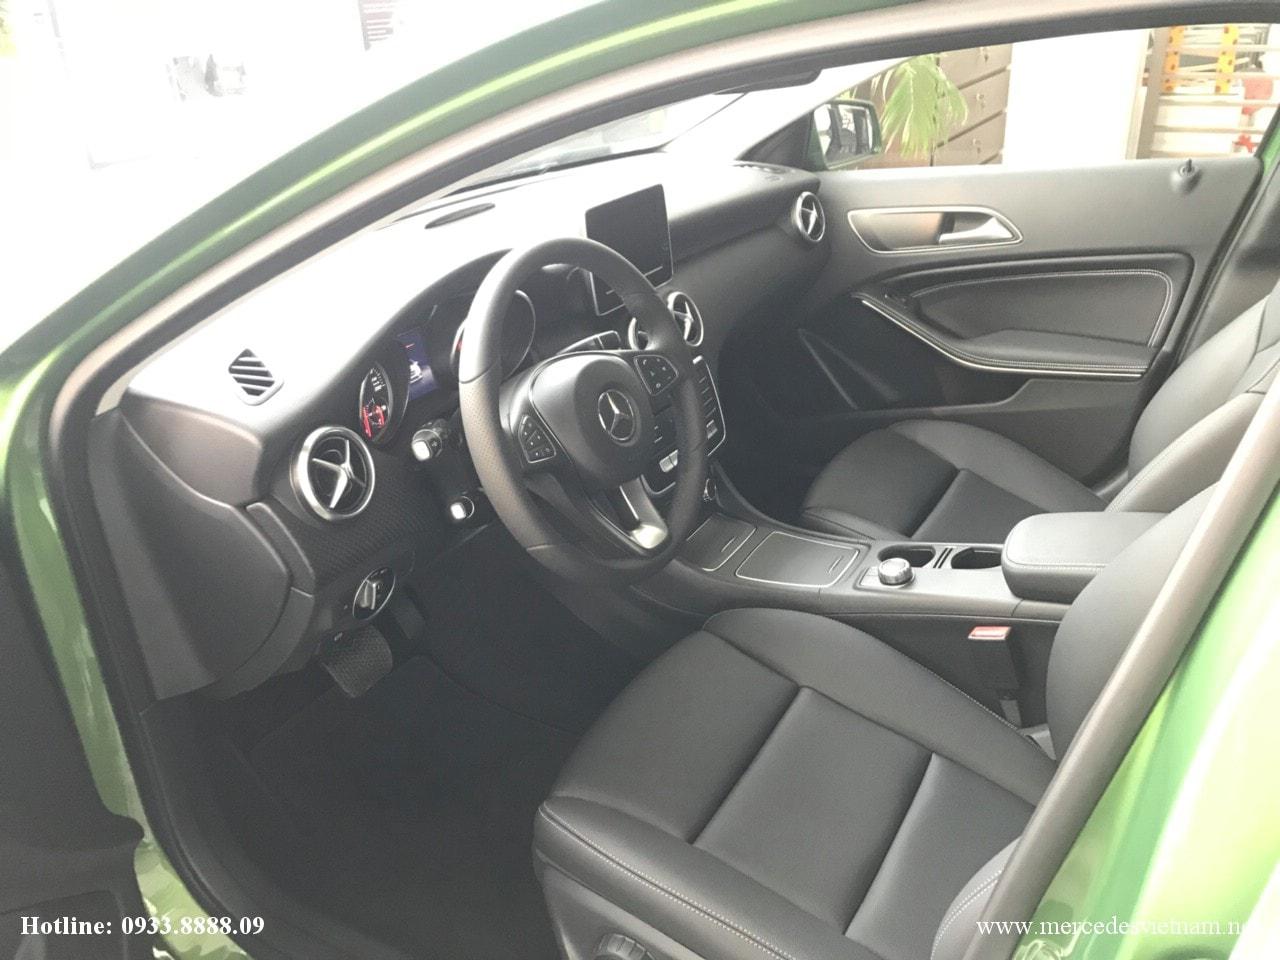 Mercedes A200 2018 2019 moi (6)-min